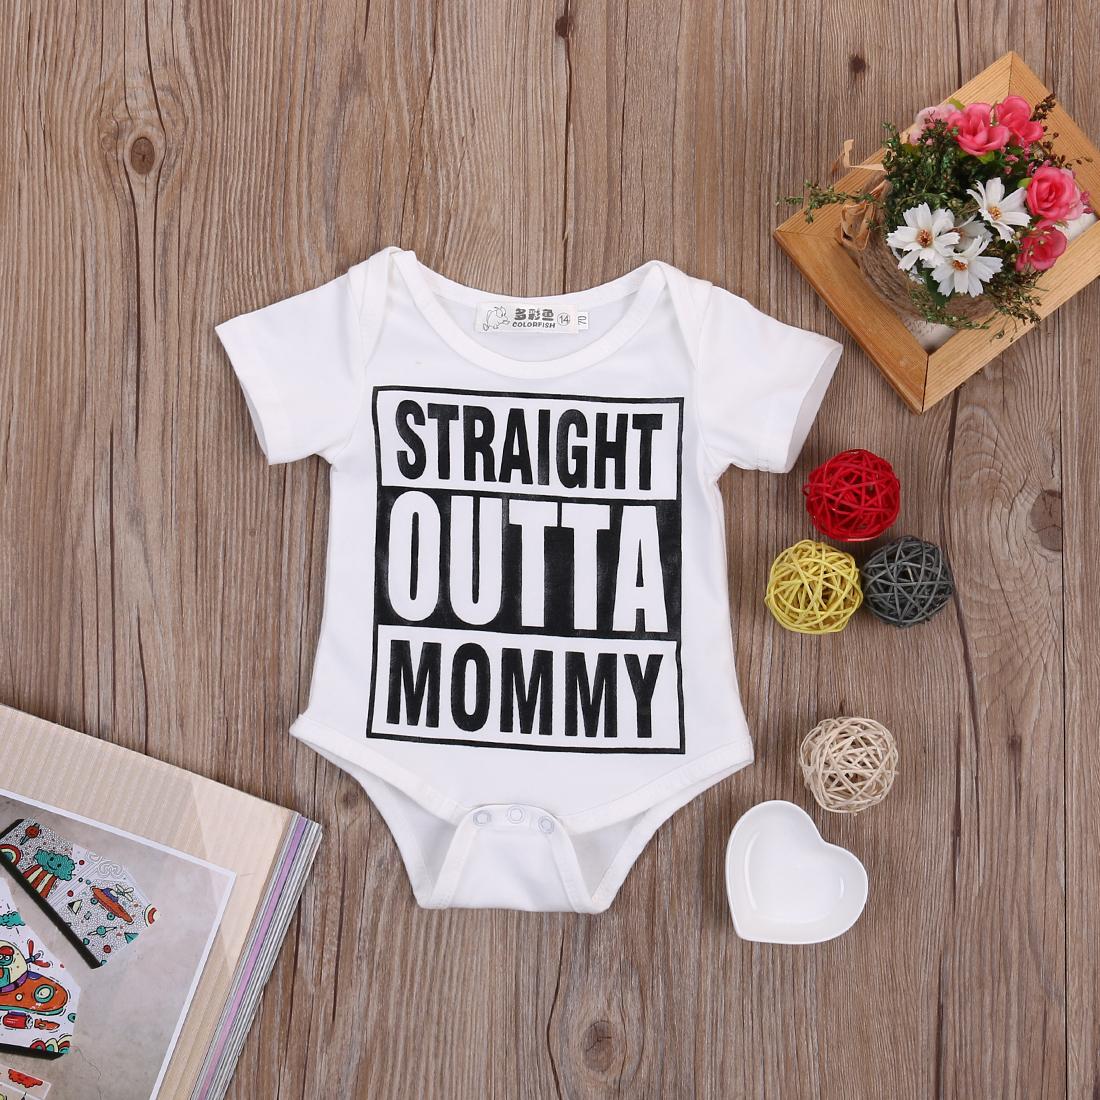 Summer 17 Newborn Kids Baby Girl Boy Clothes Quote Bodysuit Jumpsuit Playsuit Outfit Set 5